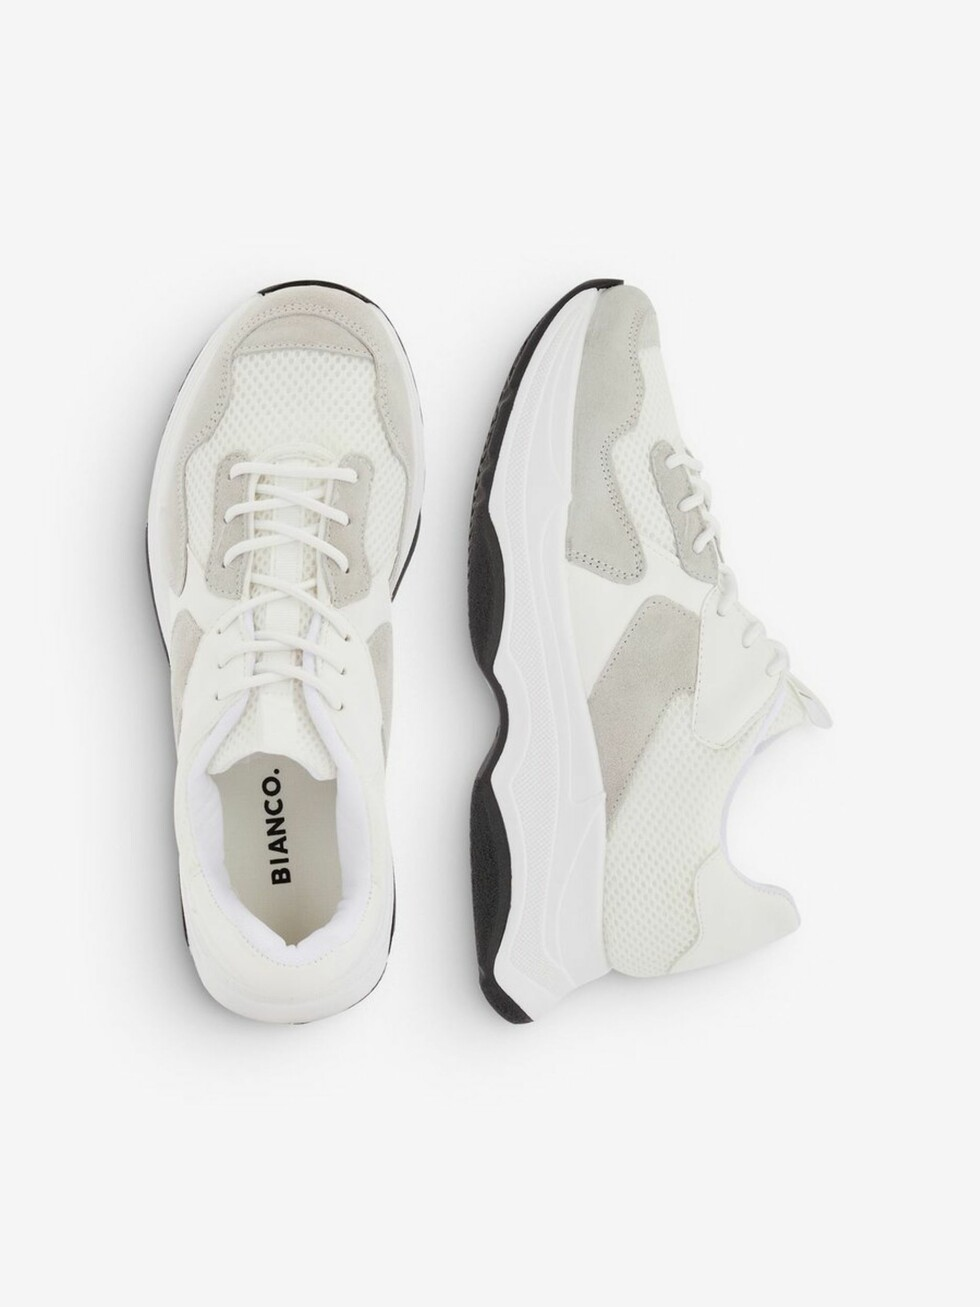 Sneakers fra Bianco |750,-| https://www.bianco.com/no/no/bi/damesko/sneakers/alia-chunky-sneakers-93250006.html?cgid=bi-women-sneakers&dwvar_colorPattern=93250006_White1